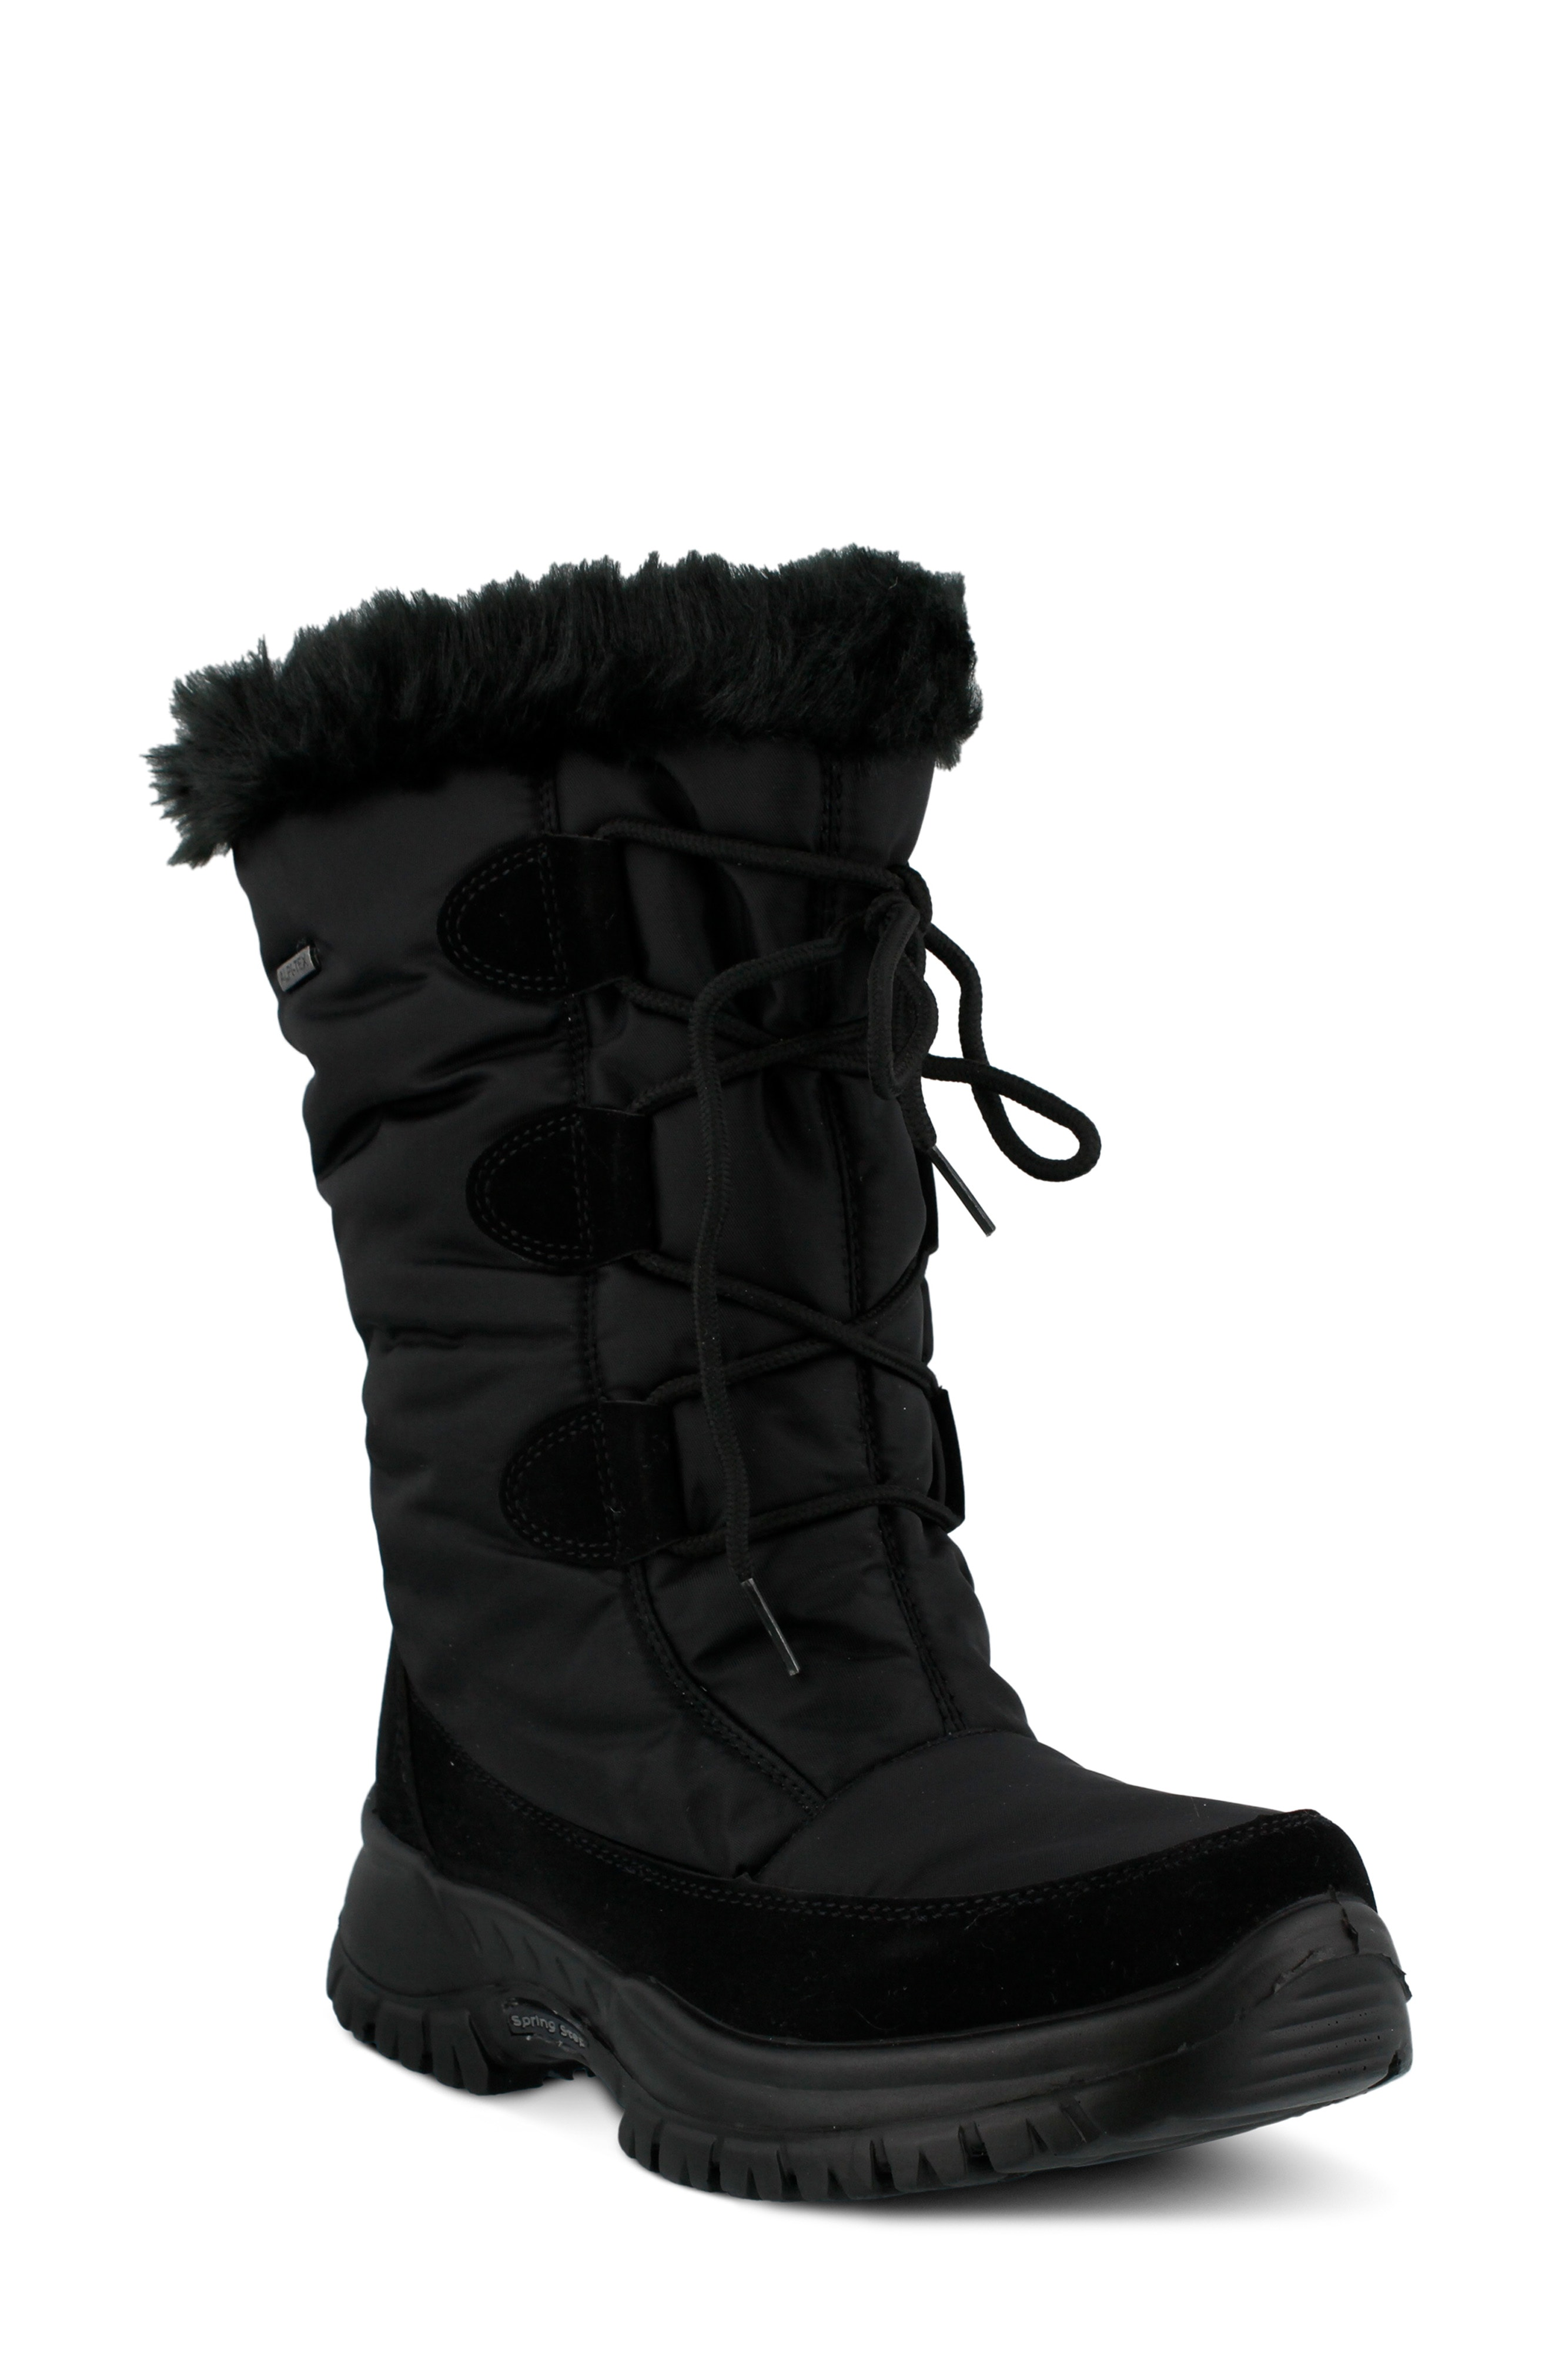 Spring Step Zurich Waterproof Faux Fur Boot (Women)